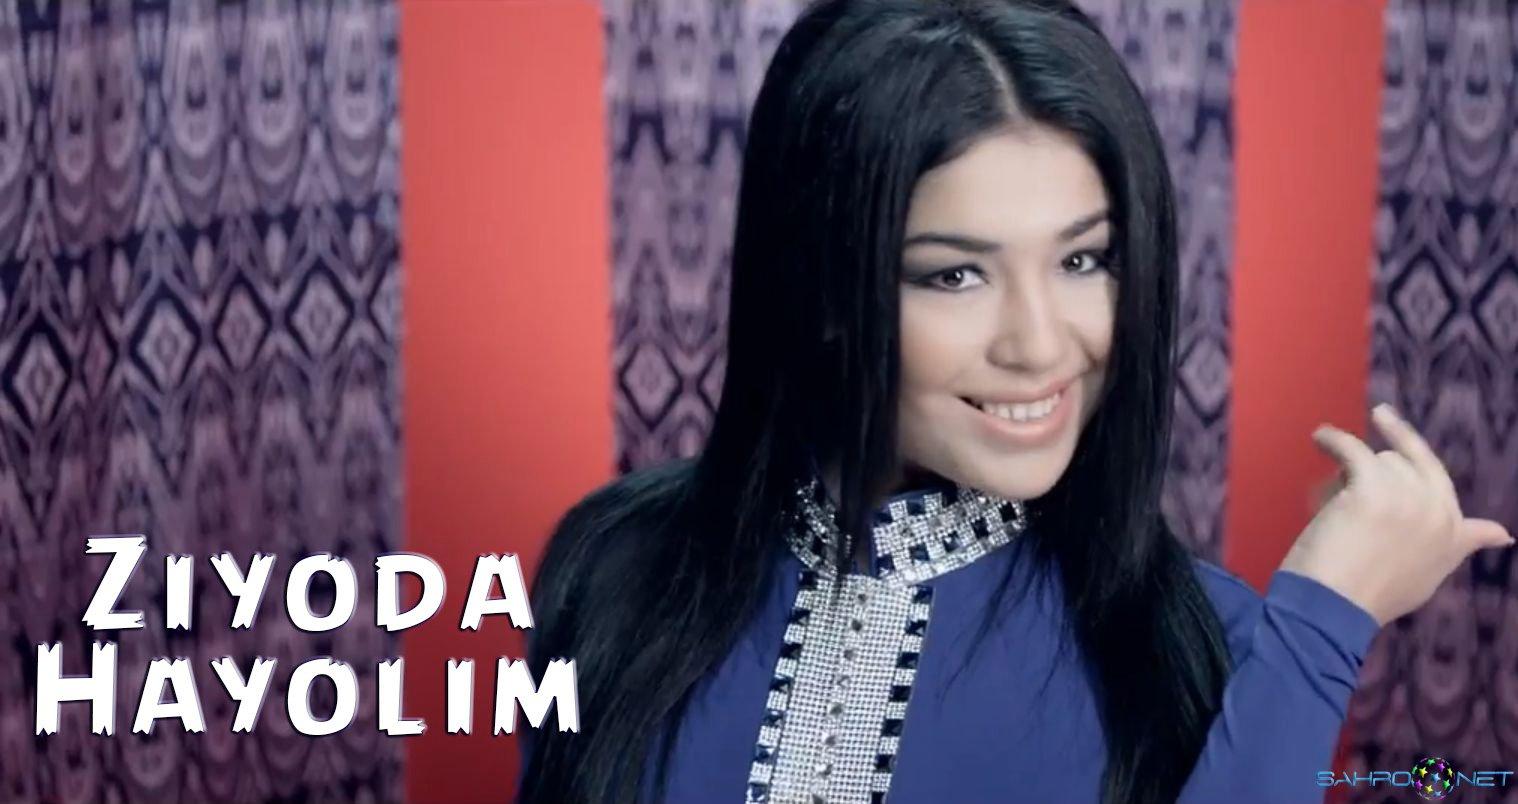 Ziyoda 2015 - Hayolim Янги Узбек Клип 2015